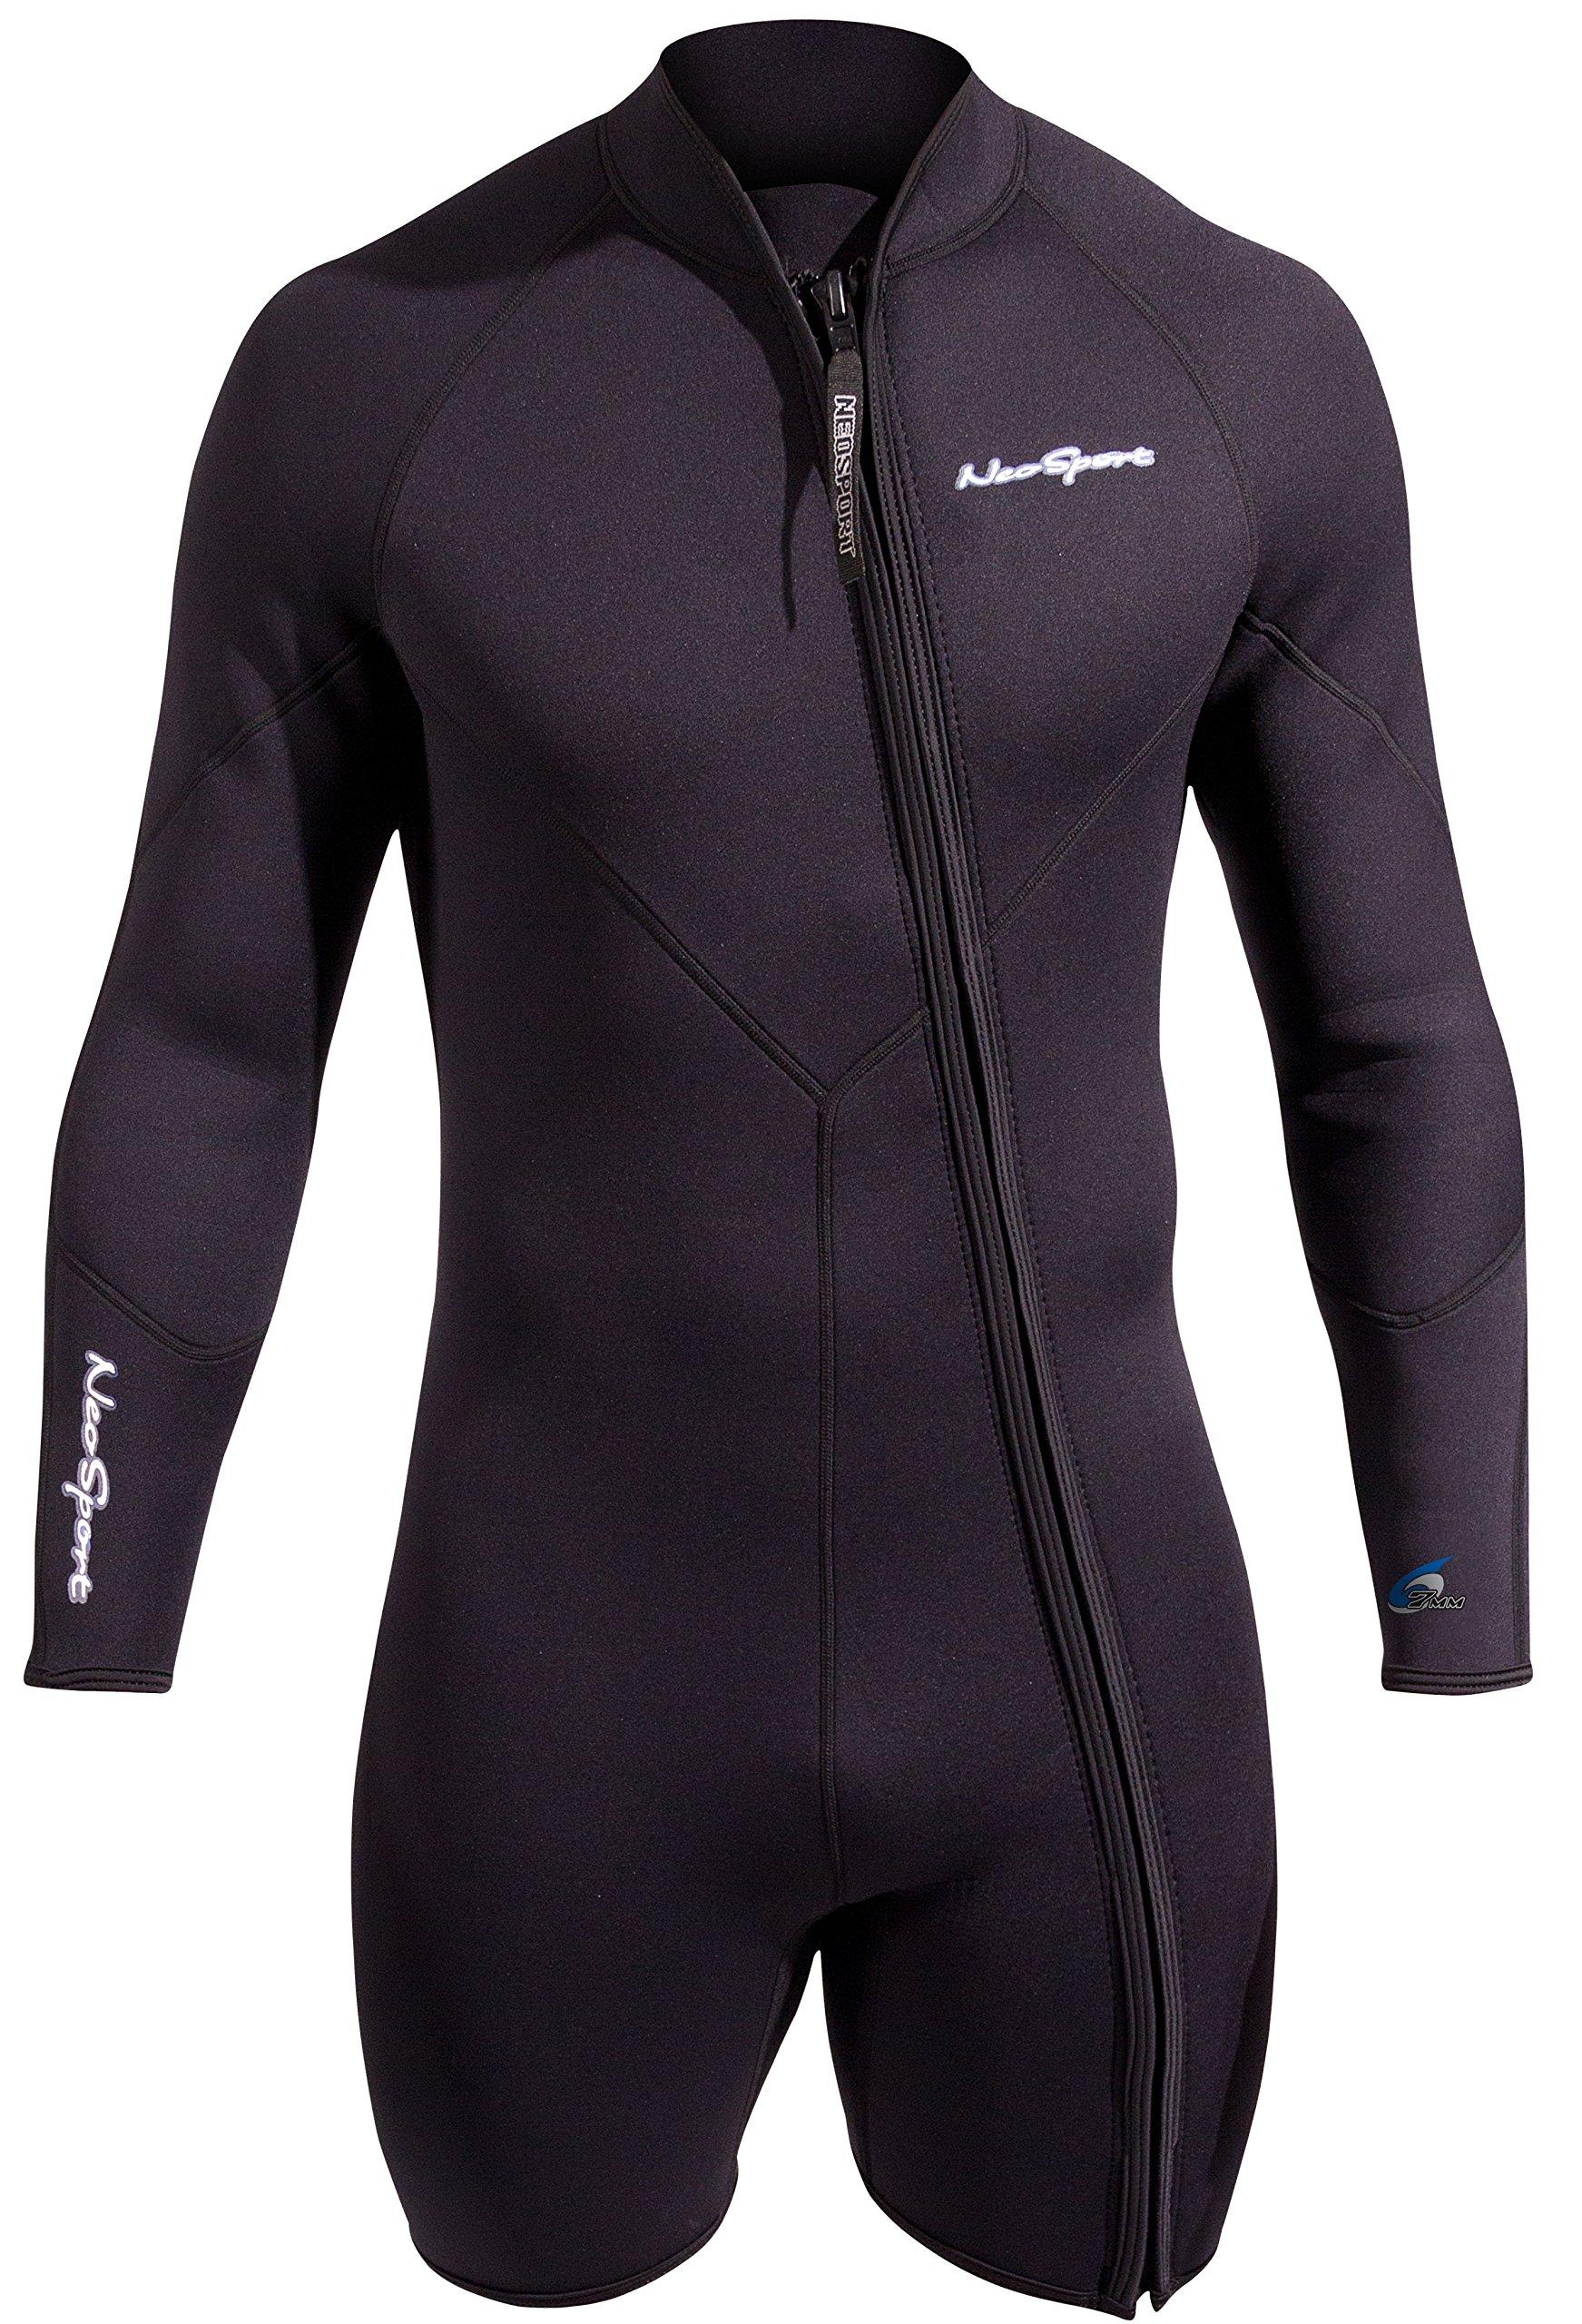 NeoSport Men's Premium Neoprene 7mm Waterman Wetsuit Jacket, Medium